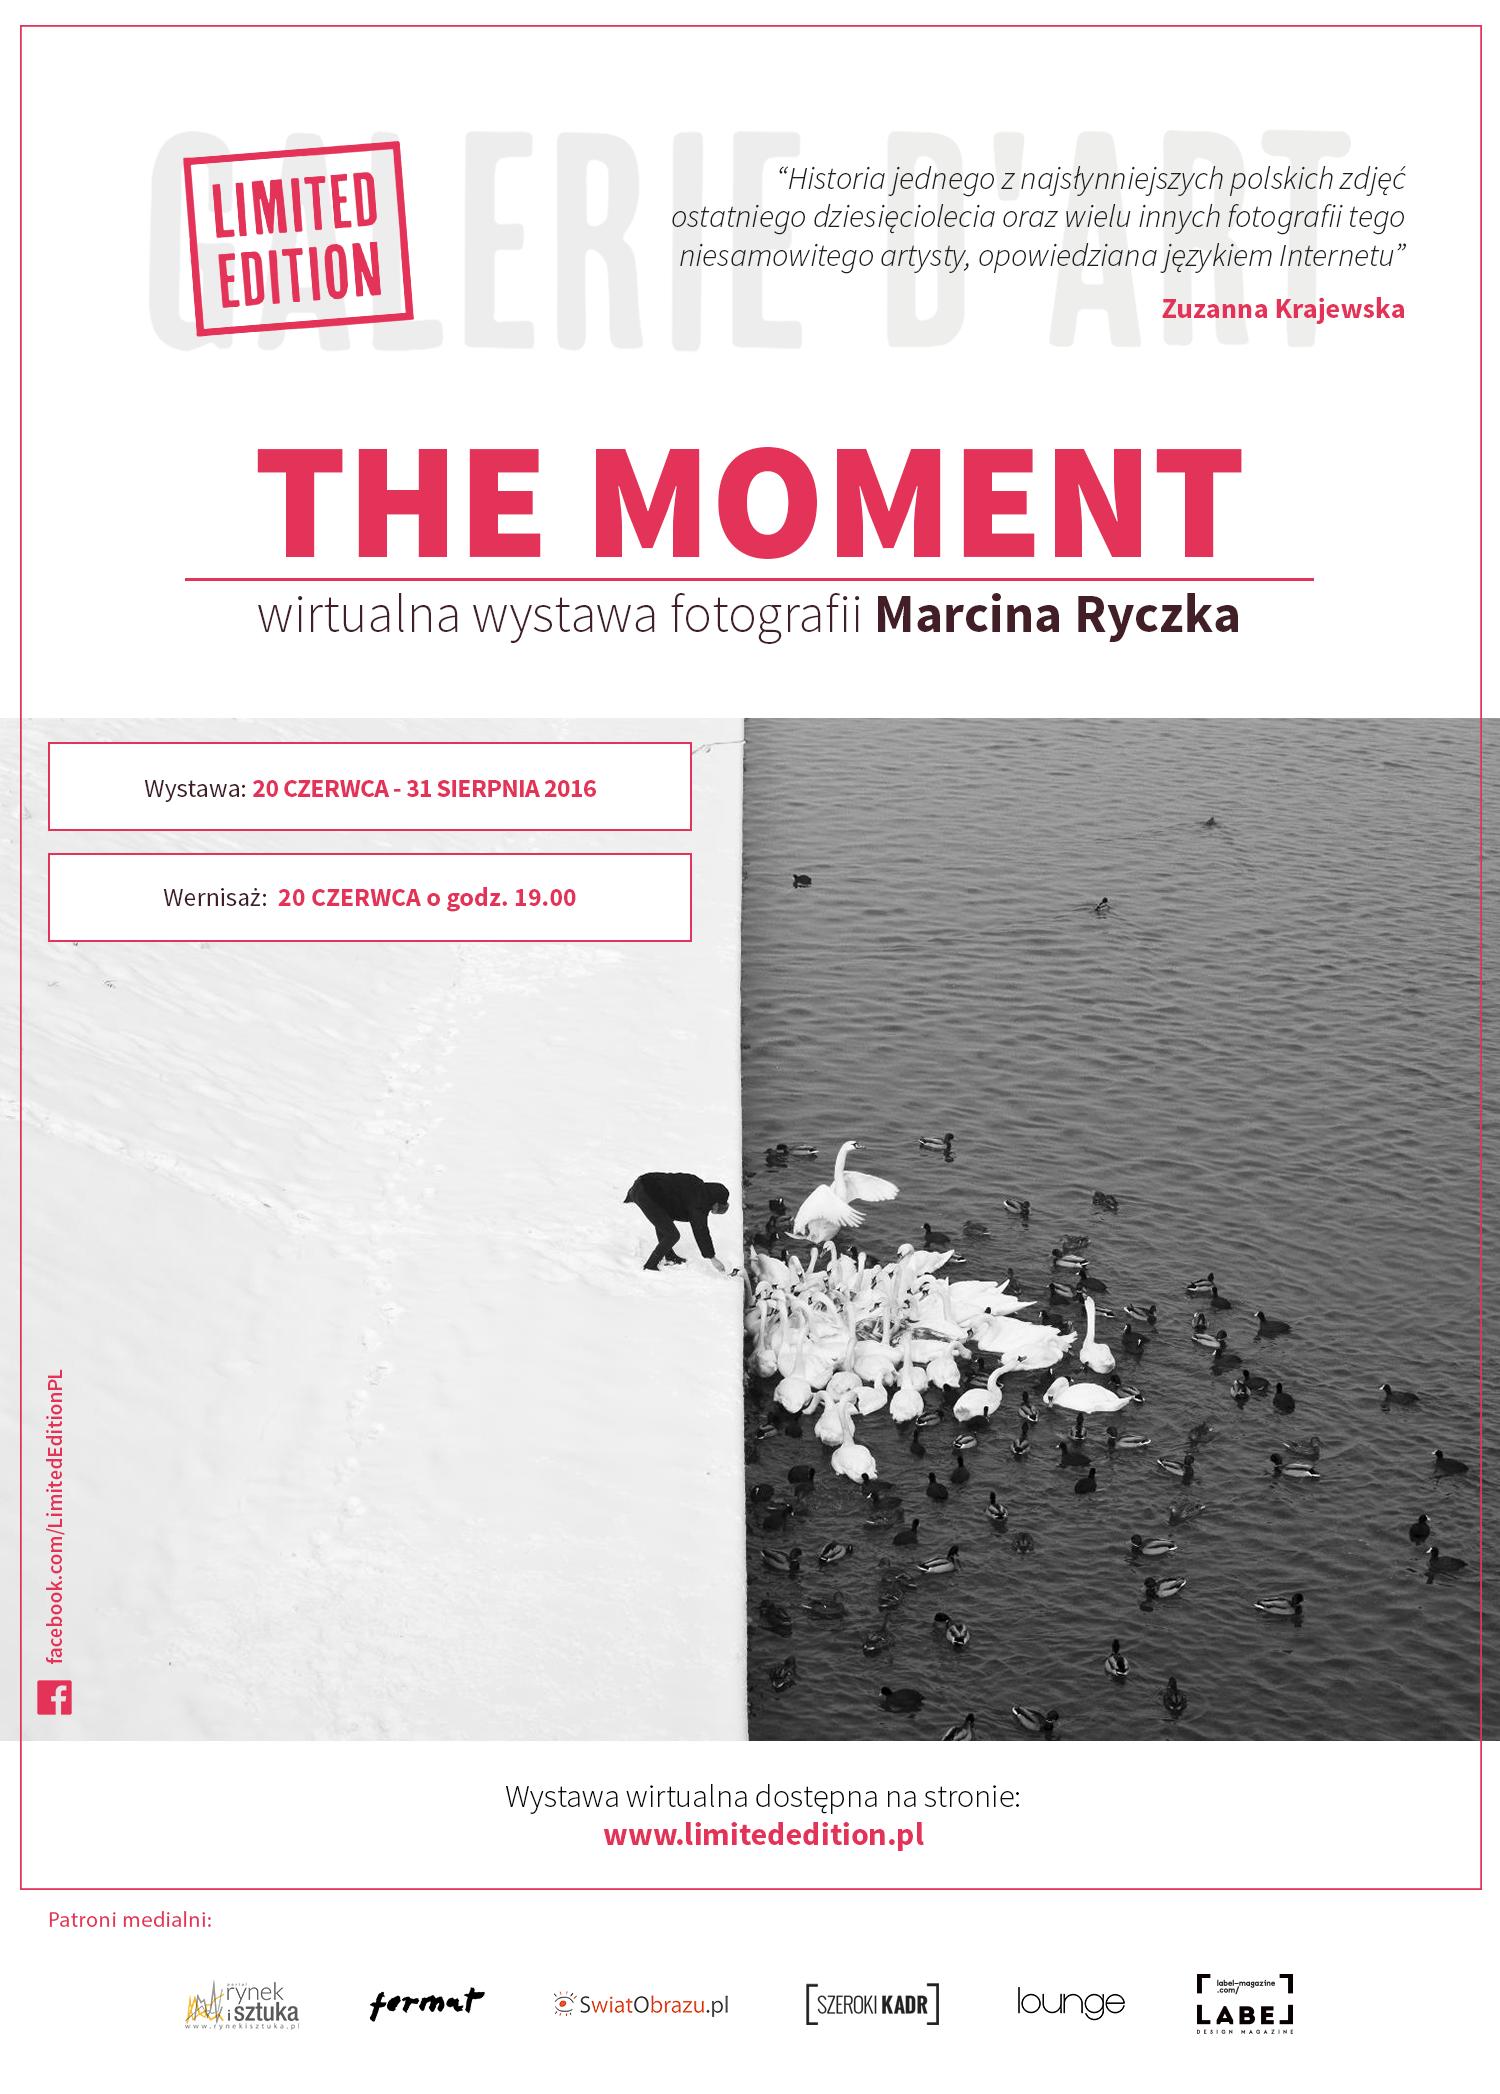 Plakat WEB The Moments - wystawa Marcina Ryczka w Limited Edition